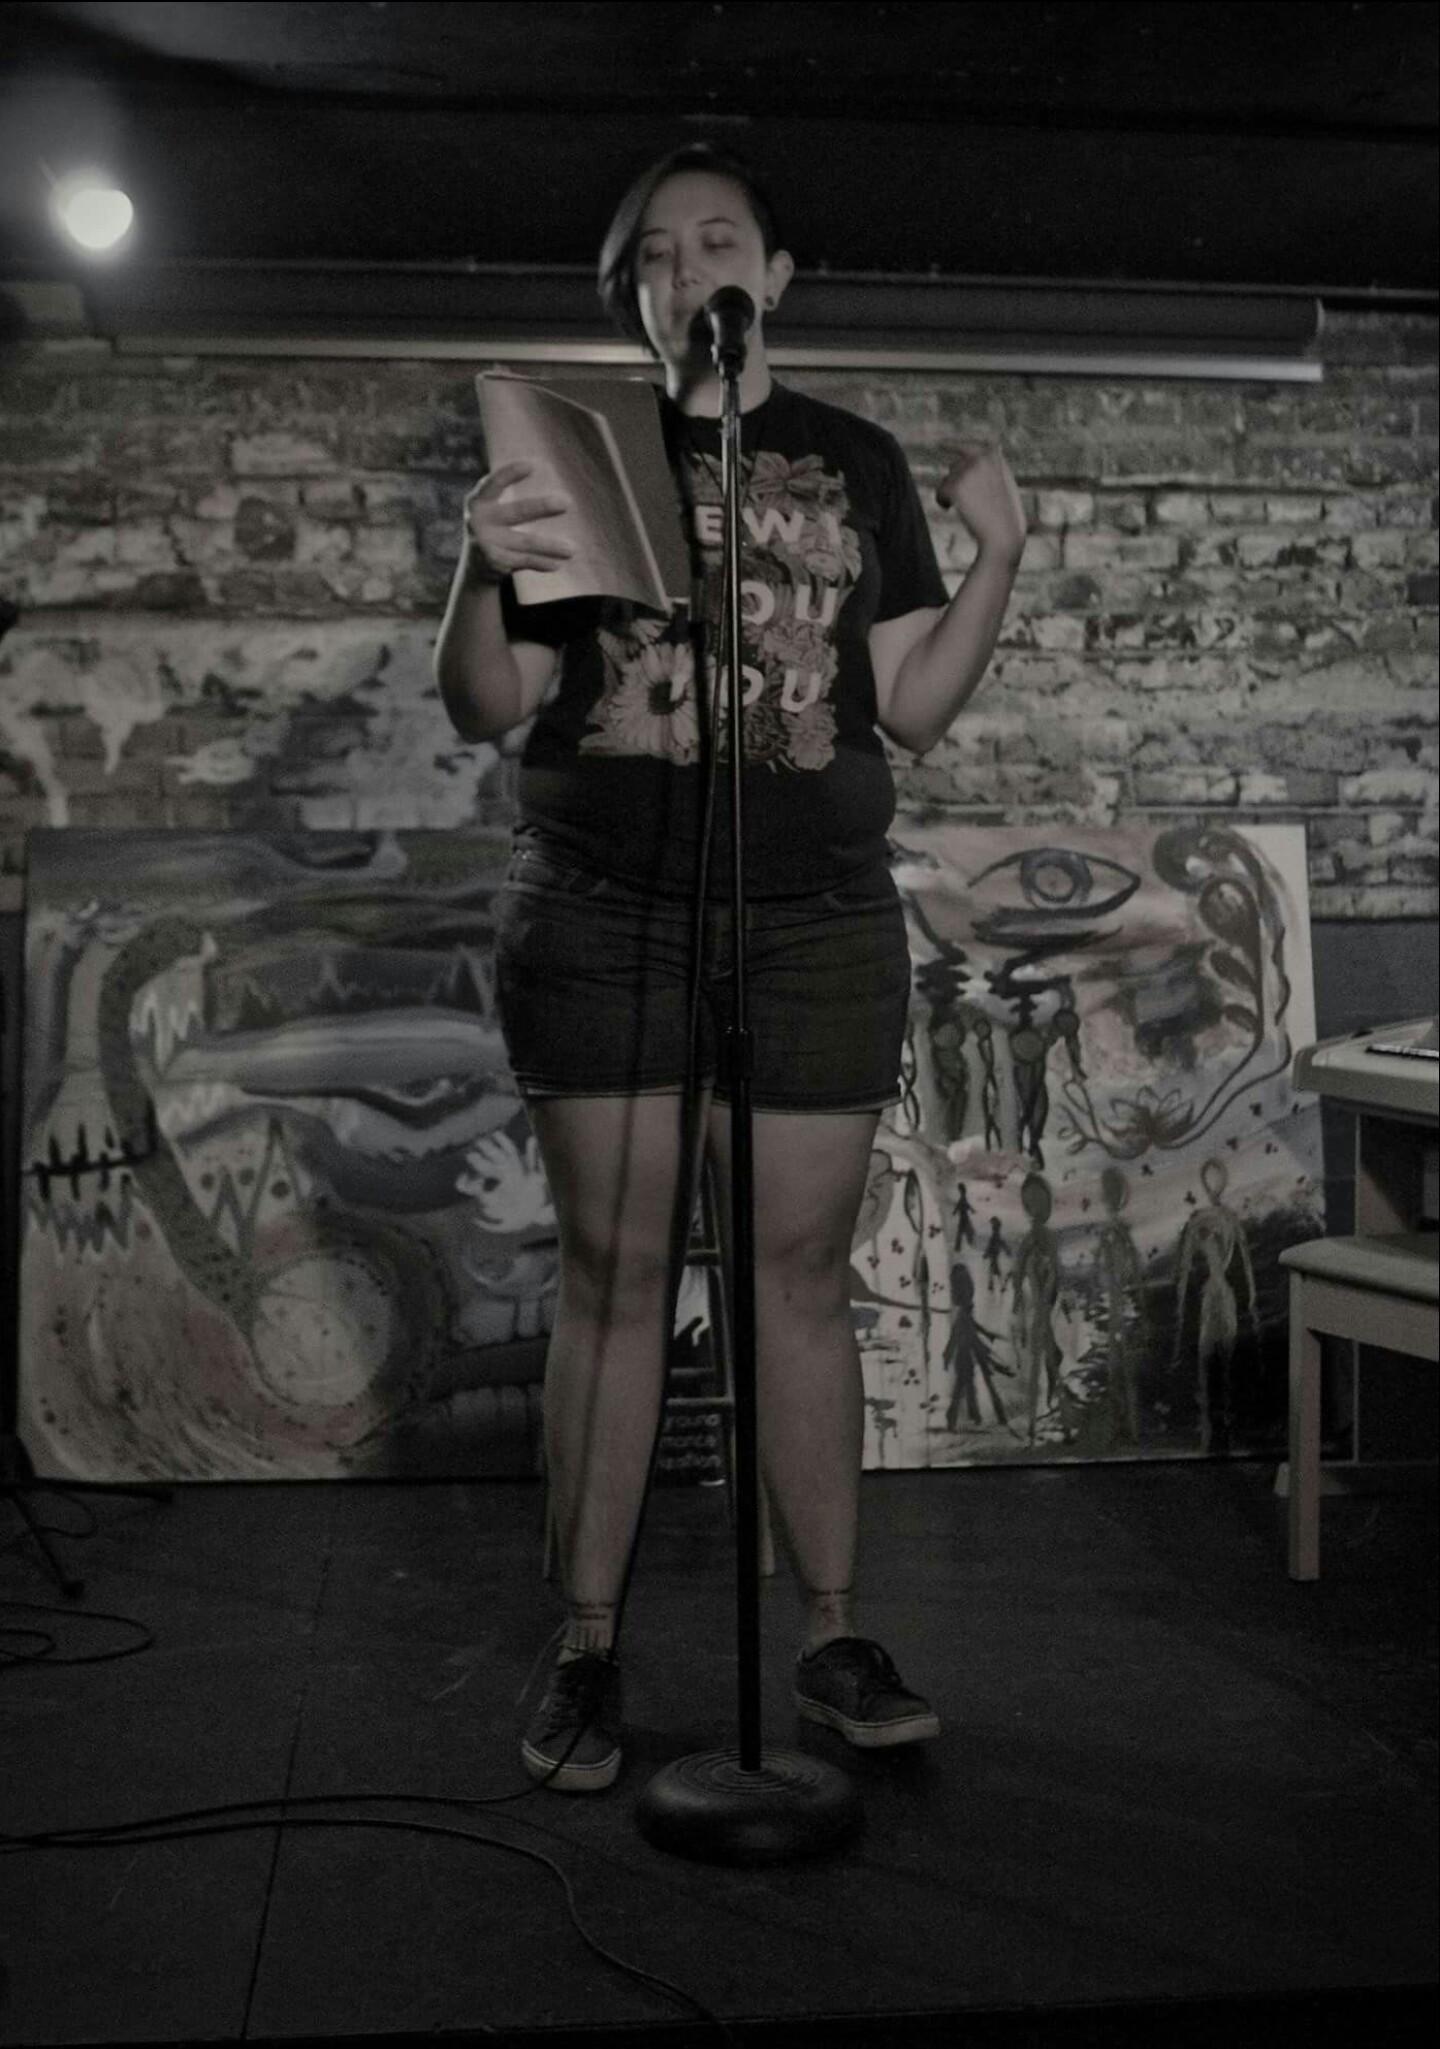 @ Monday Night RUPO in Downtown Riverside. Photo by:  Typewriterone